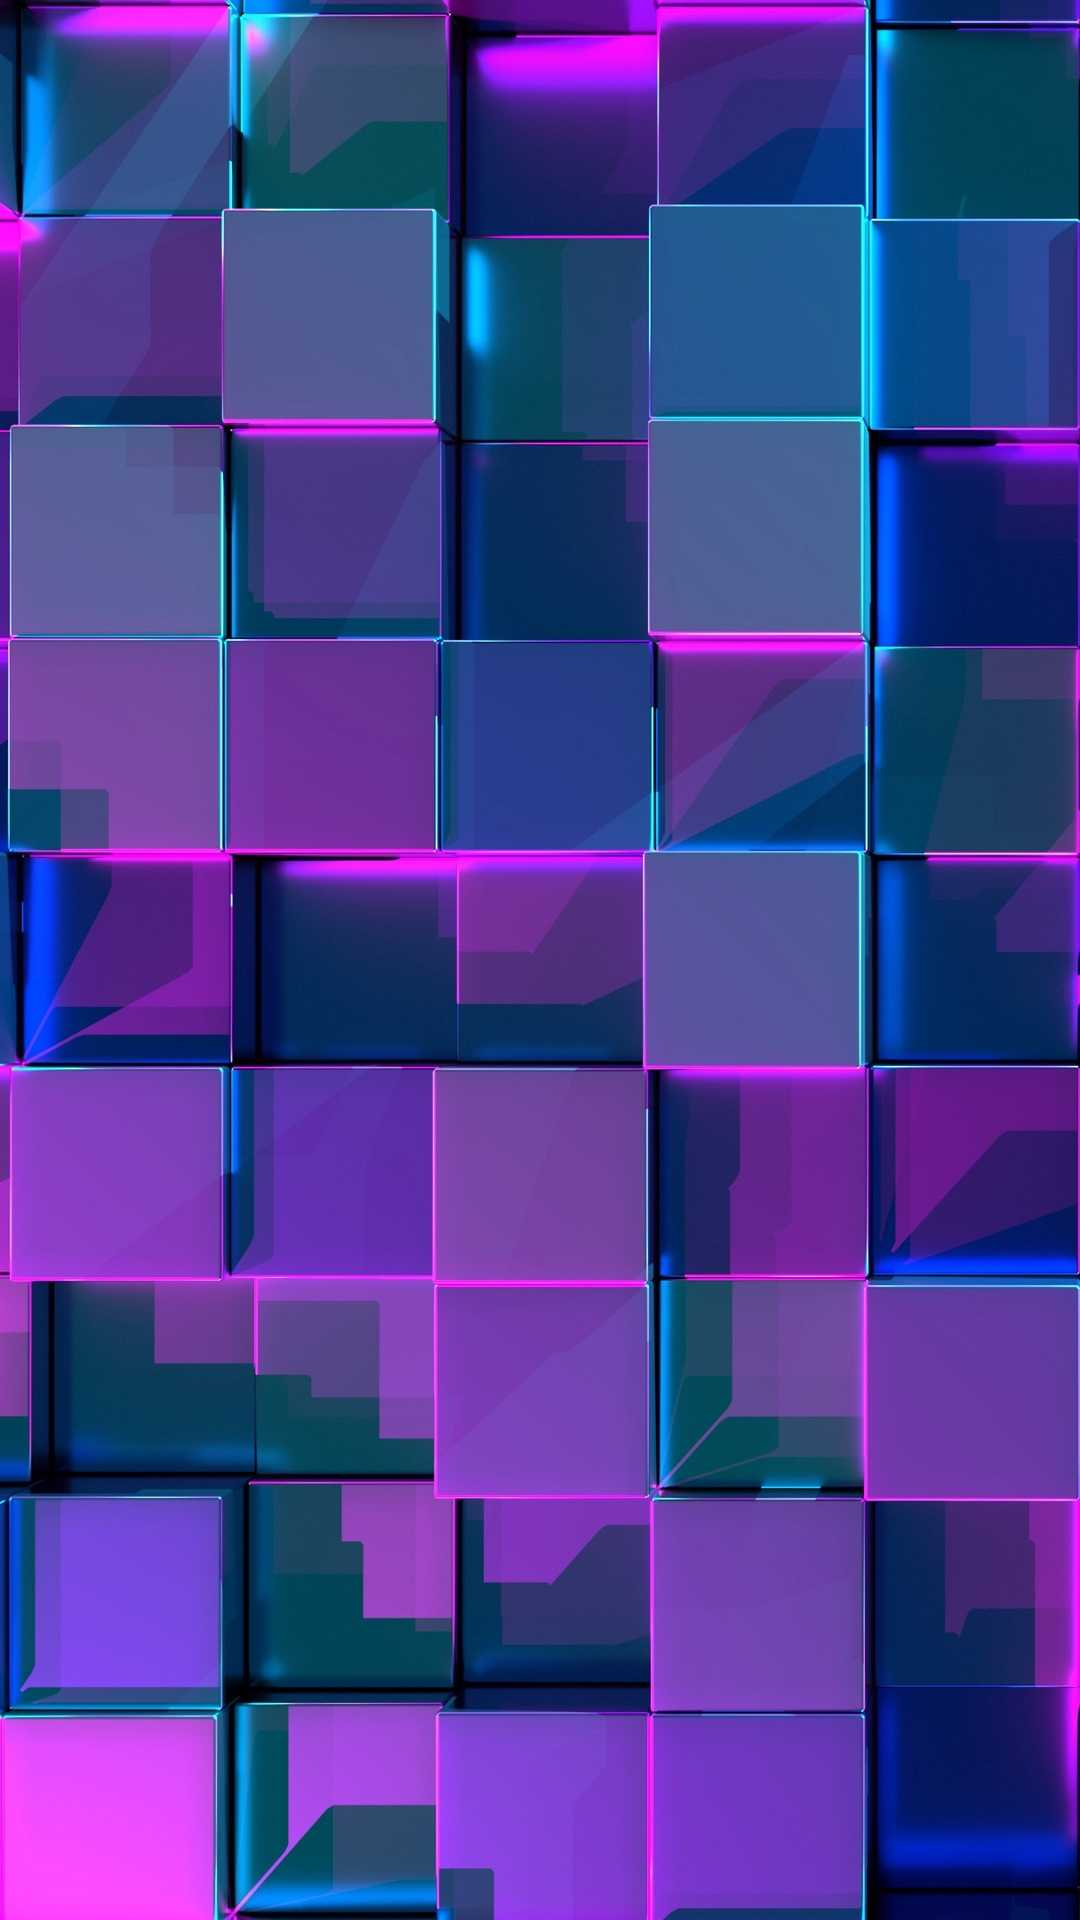 3D Phone Wallpaper [1080x1920] - 091